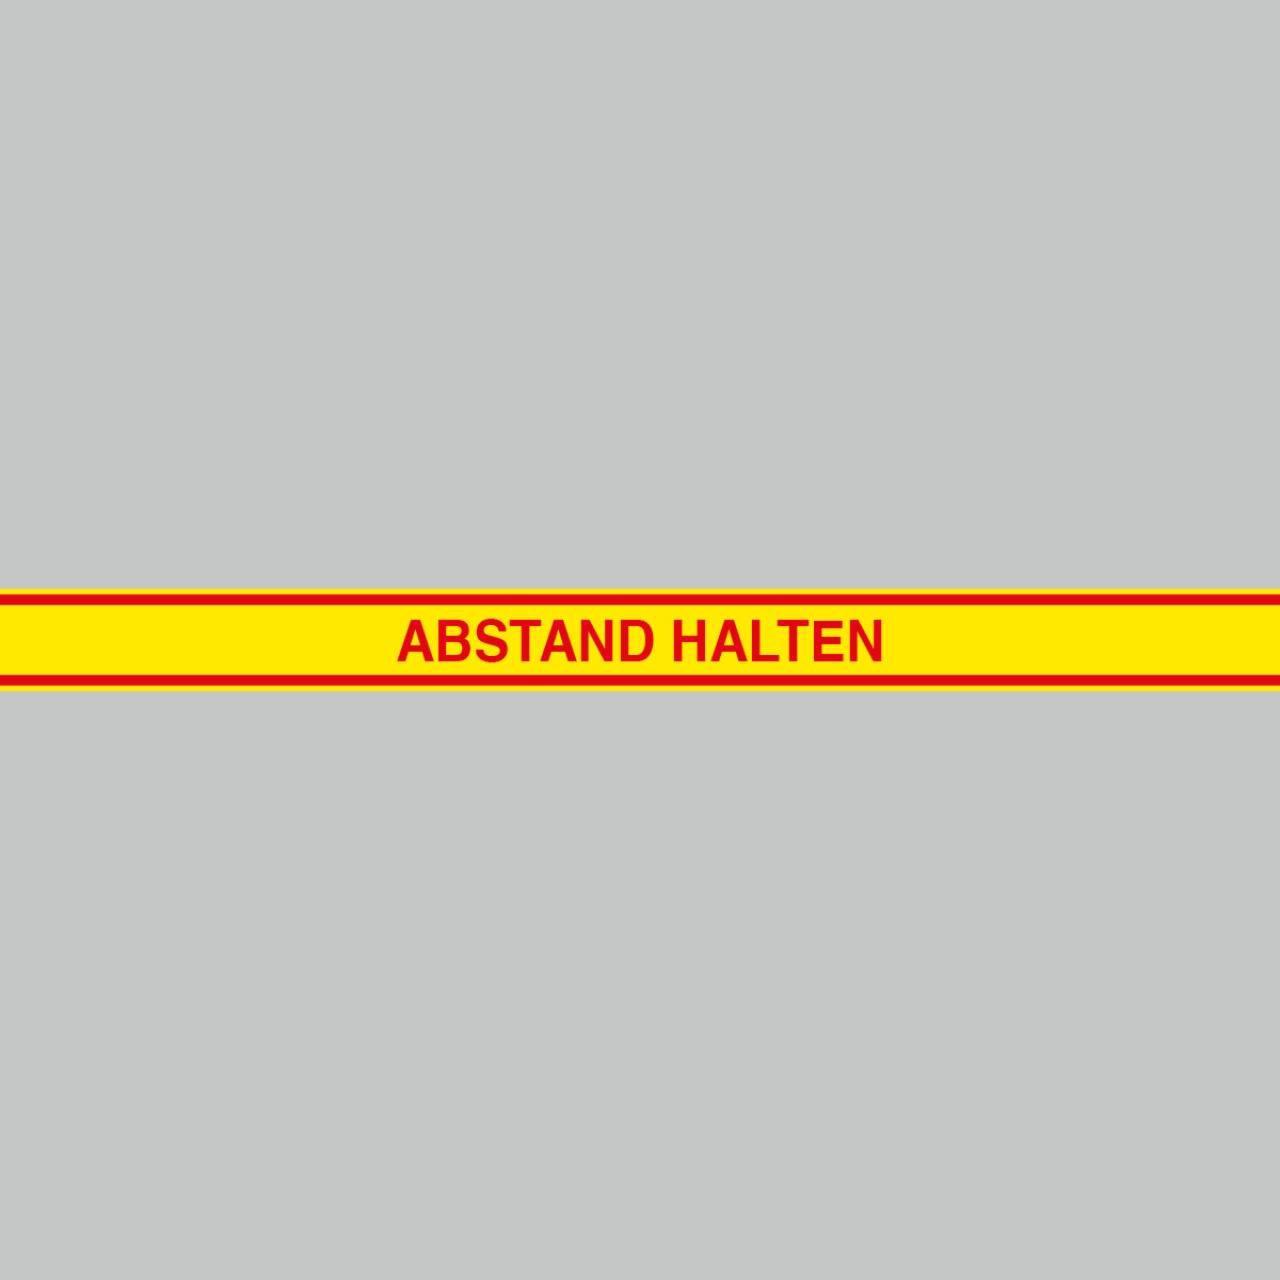 Fußbodenaufkleber rot-gelb, 120x9,6cm – Abstand halten